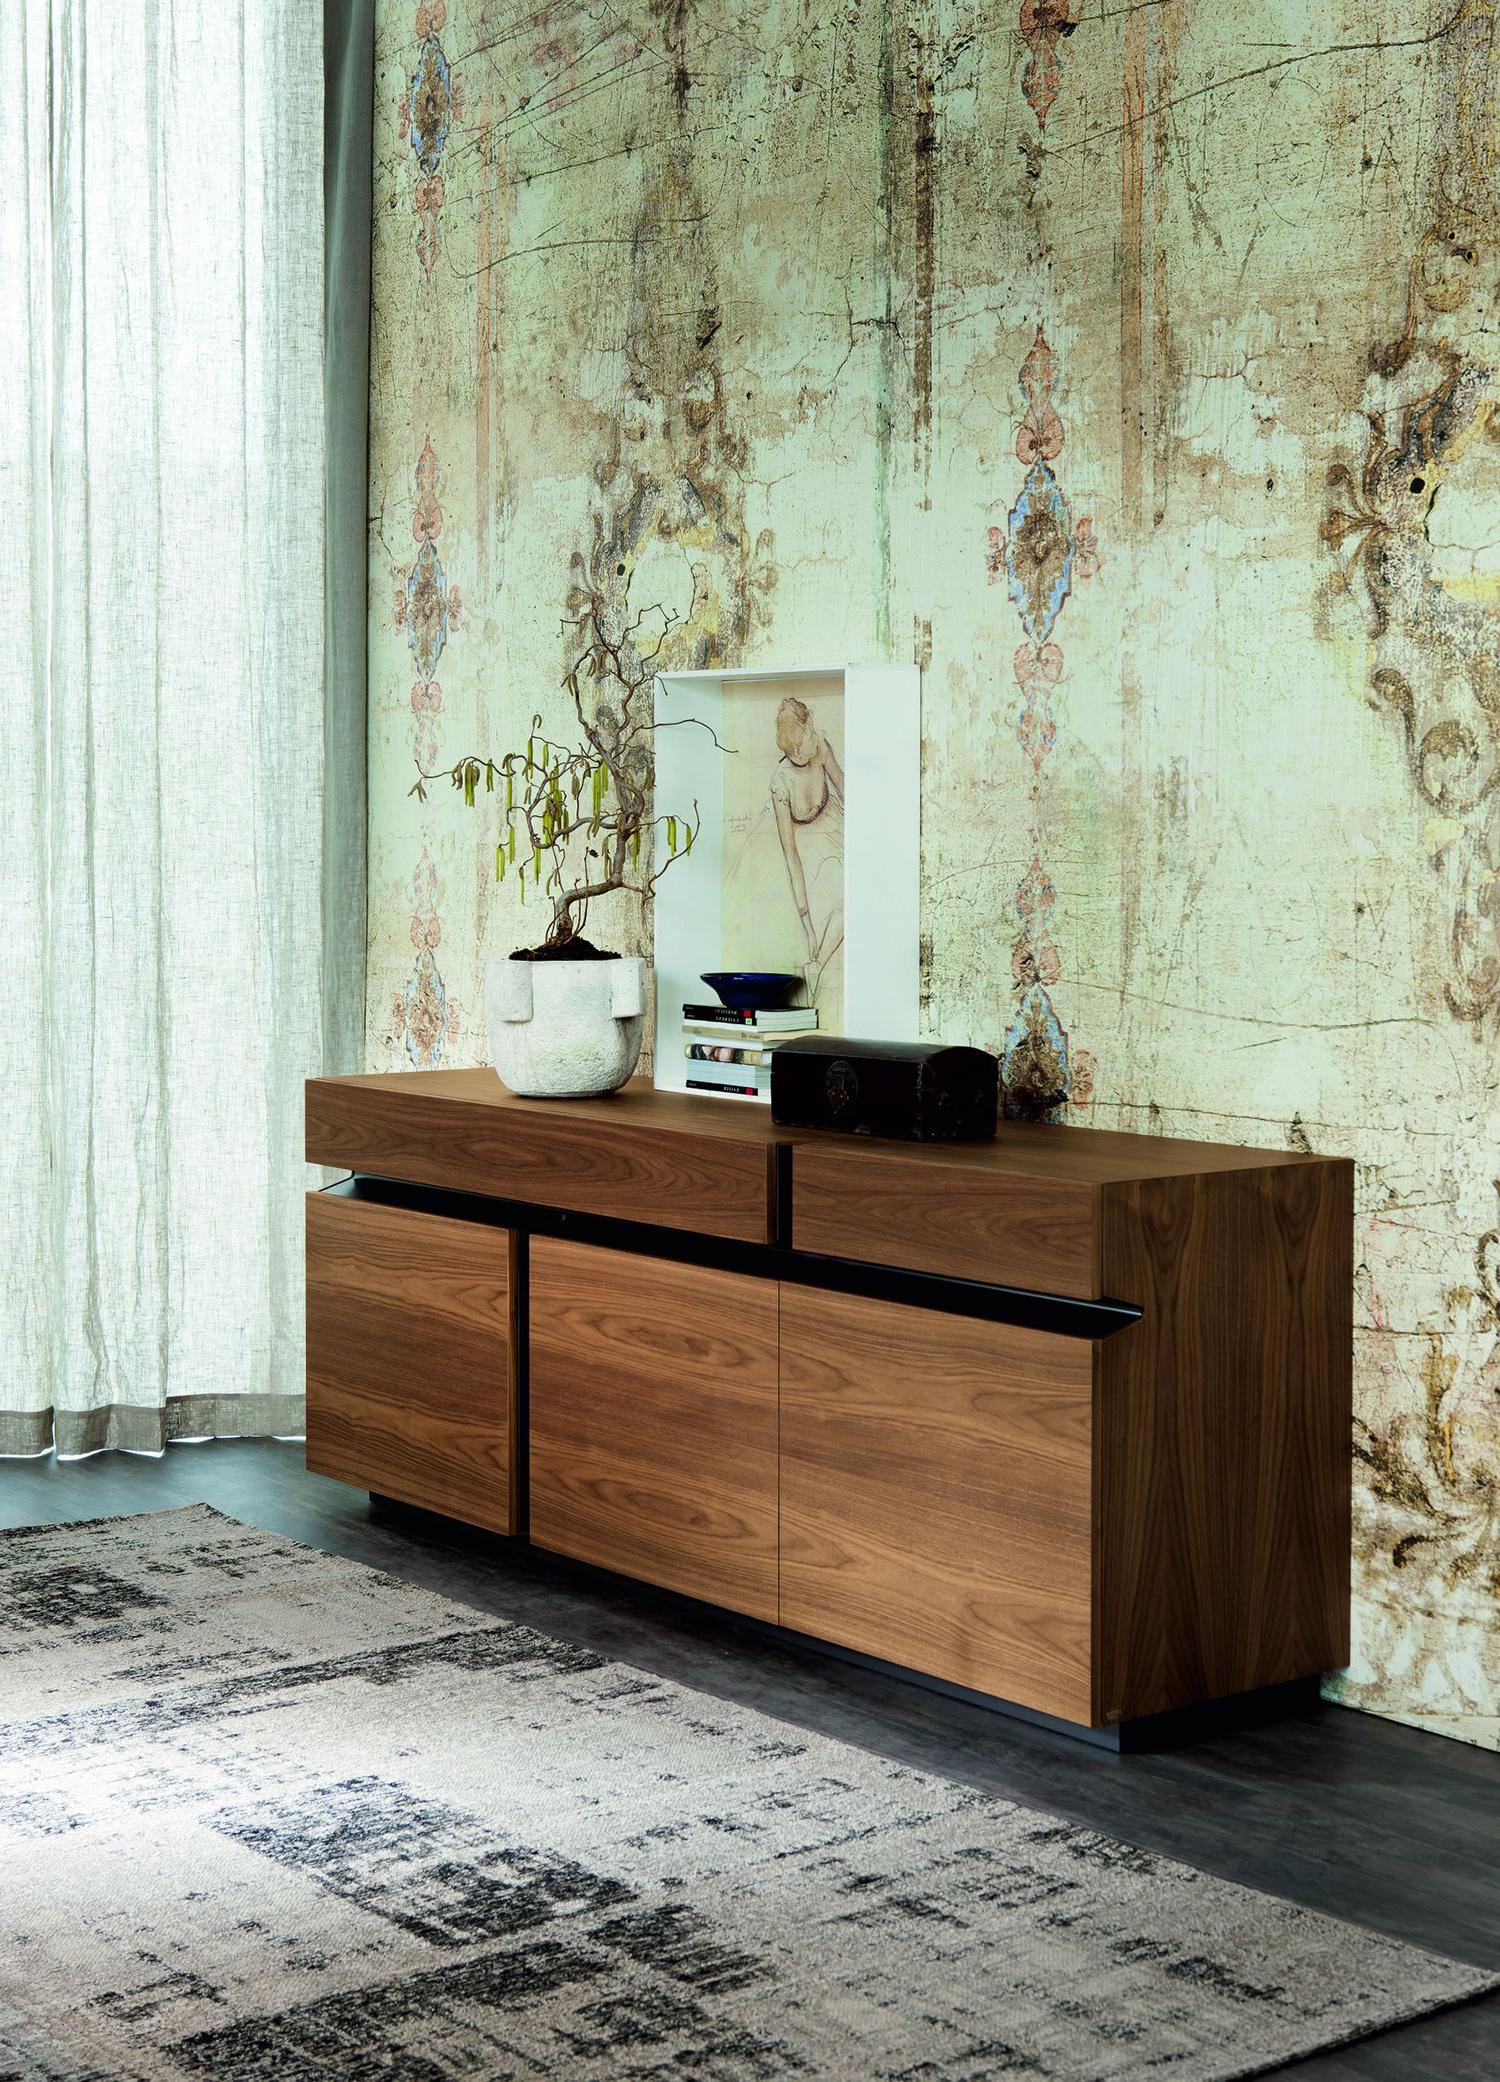 Prisma | Glass Shelves, Drawers And Shelves Inside Burnt Oak Metal Sideboards (View 16 of 20)